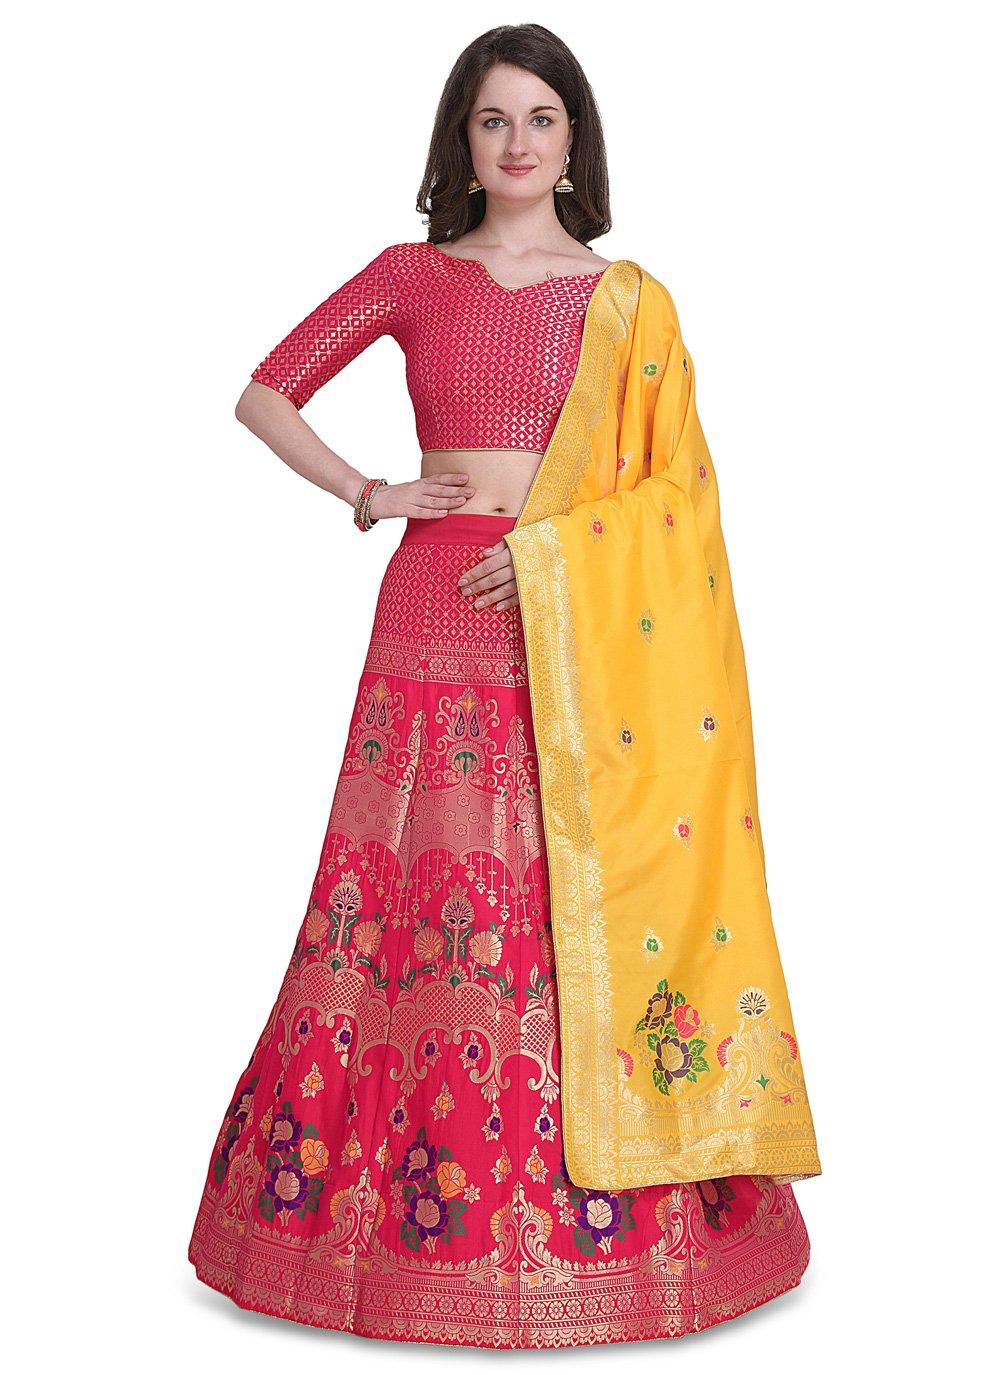 Jacquard Woven Lehenga Choli in Hot Pink